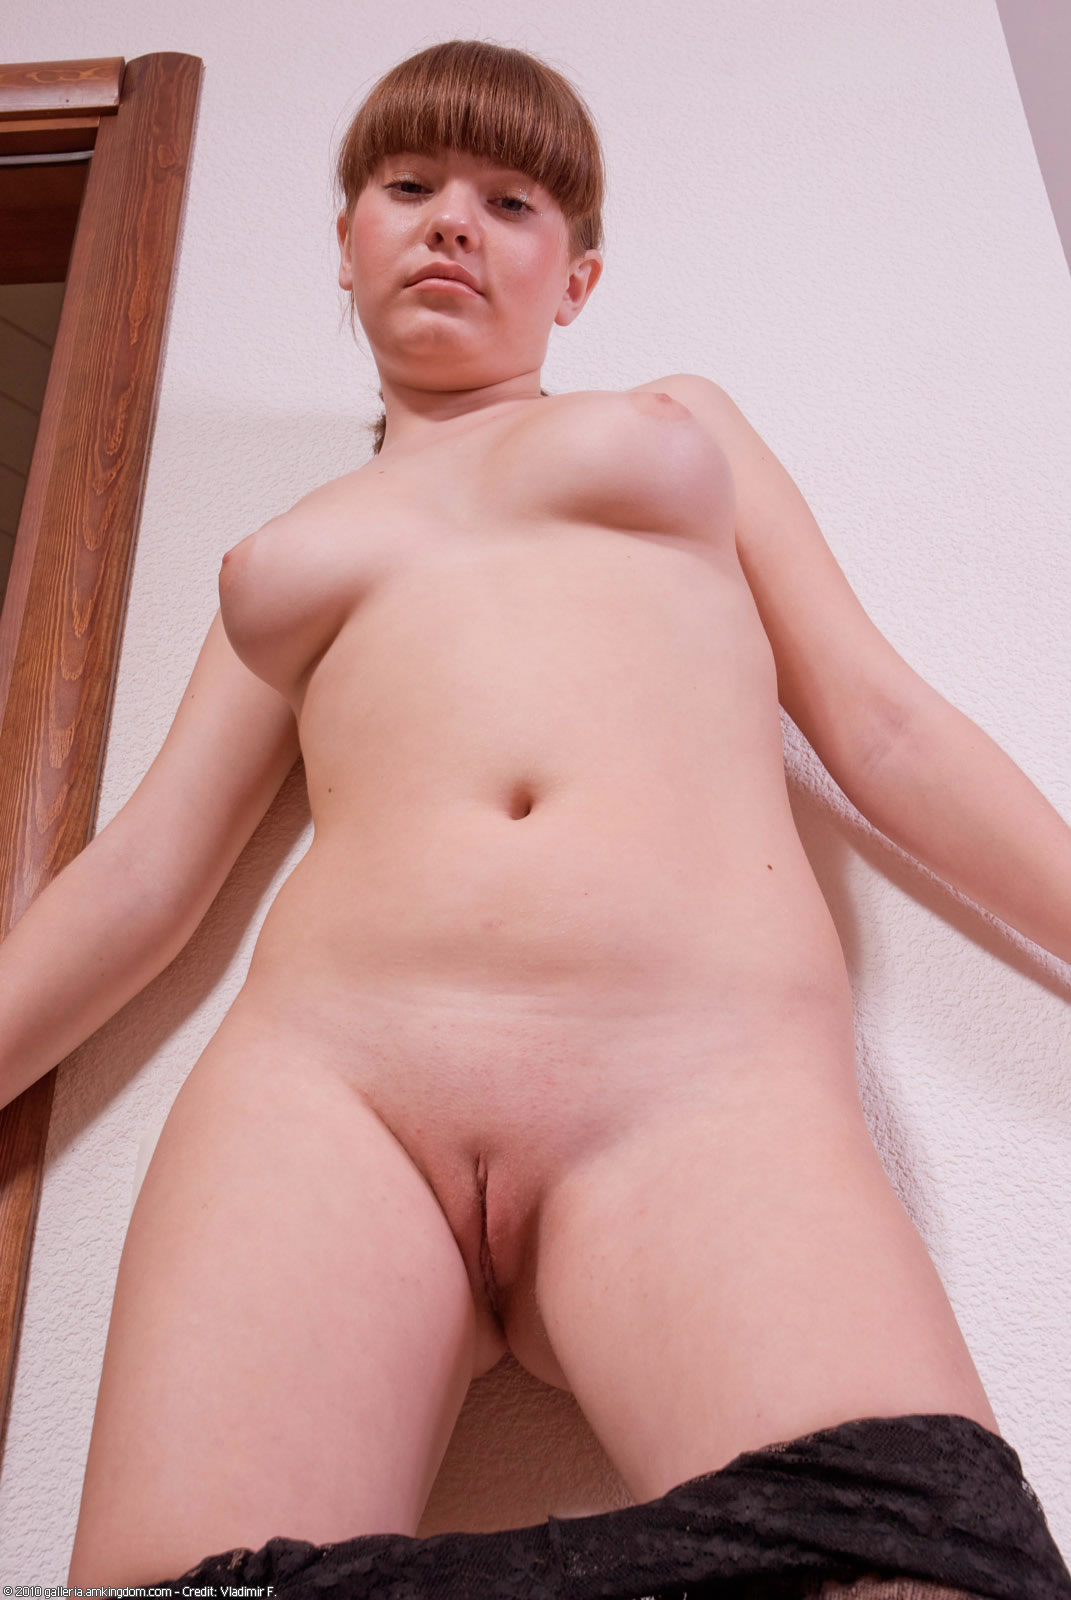 Atk galleria nude amateurs apologise